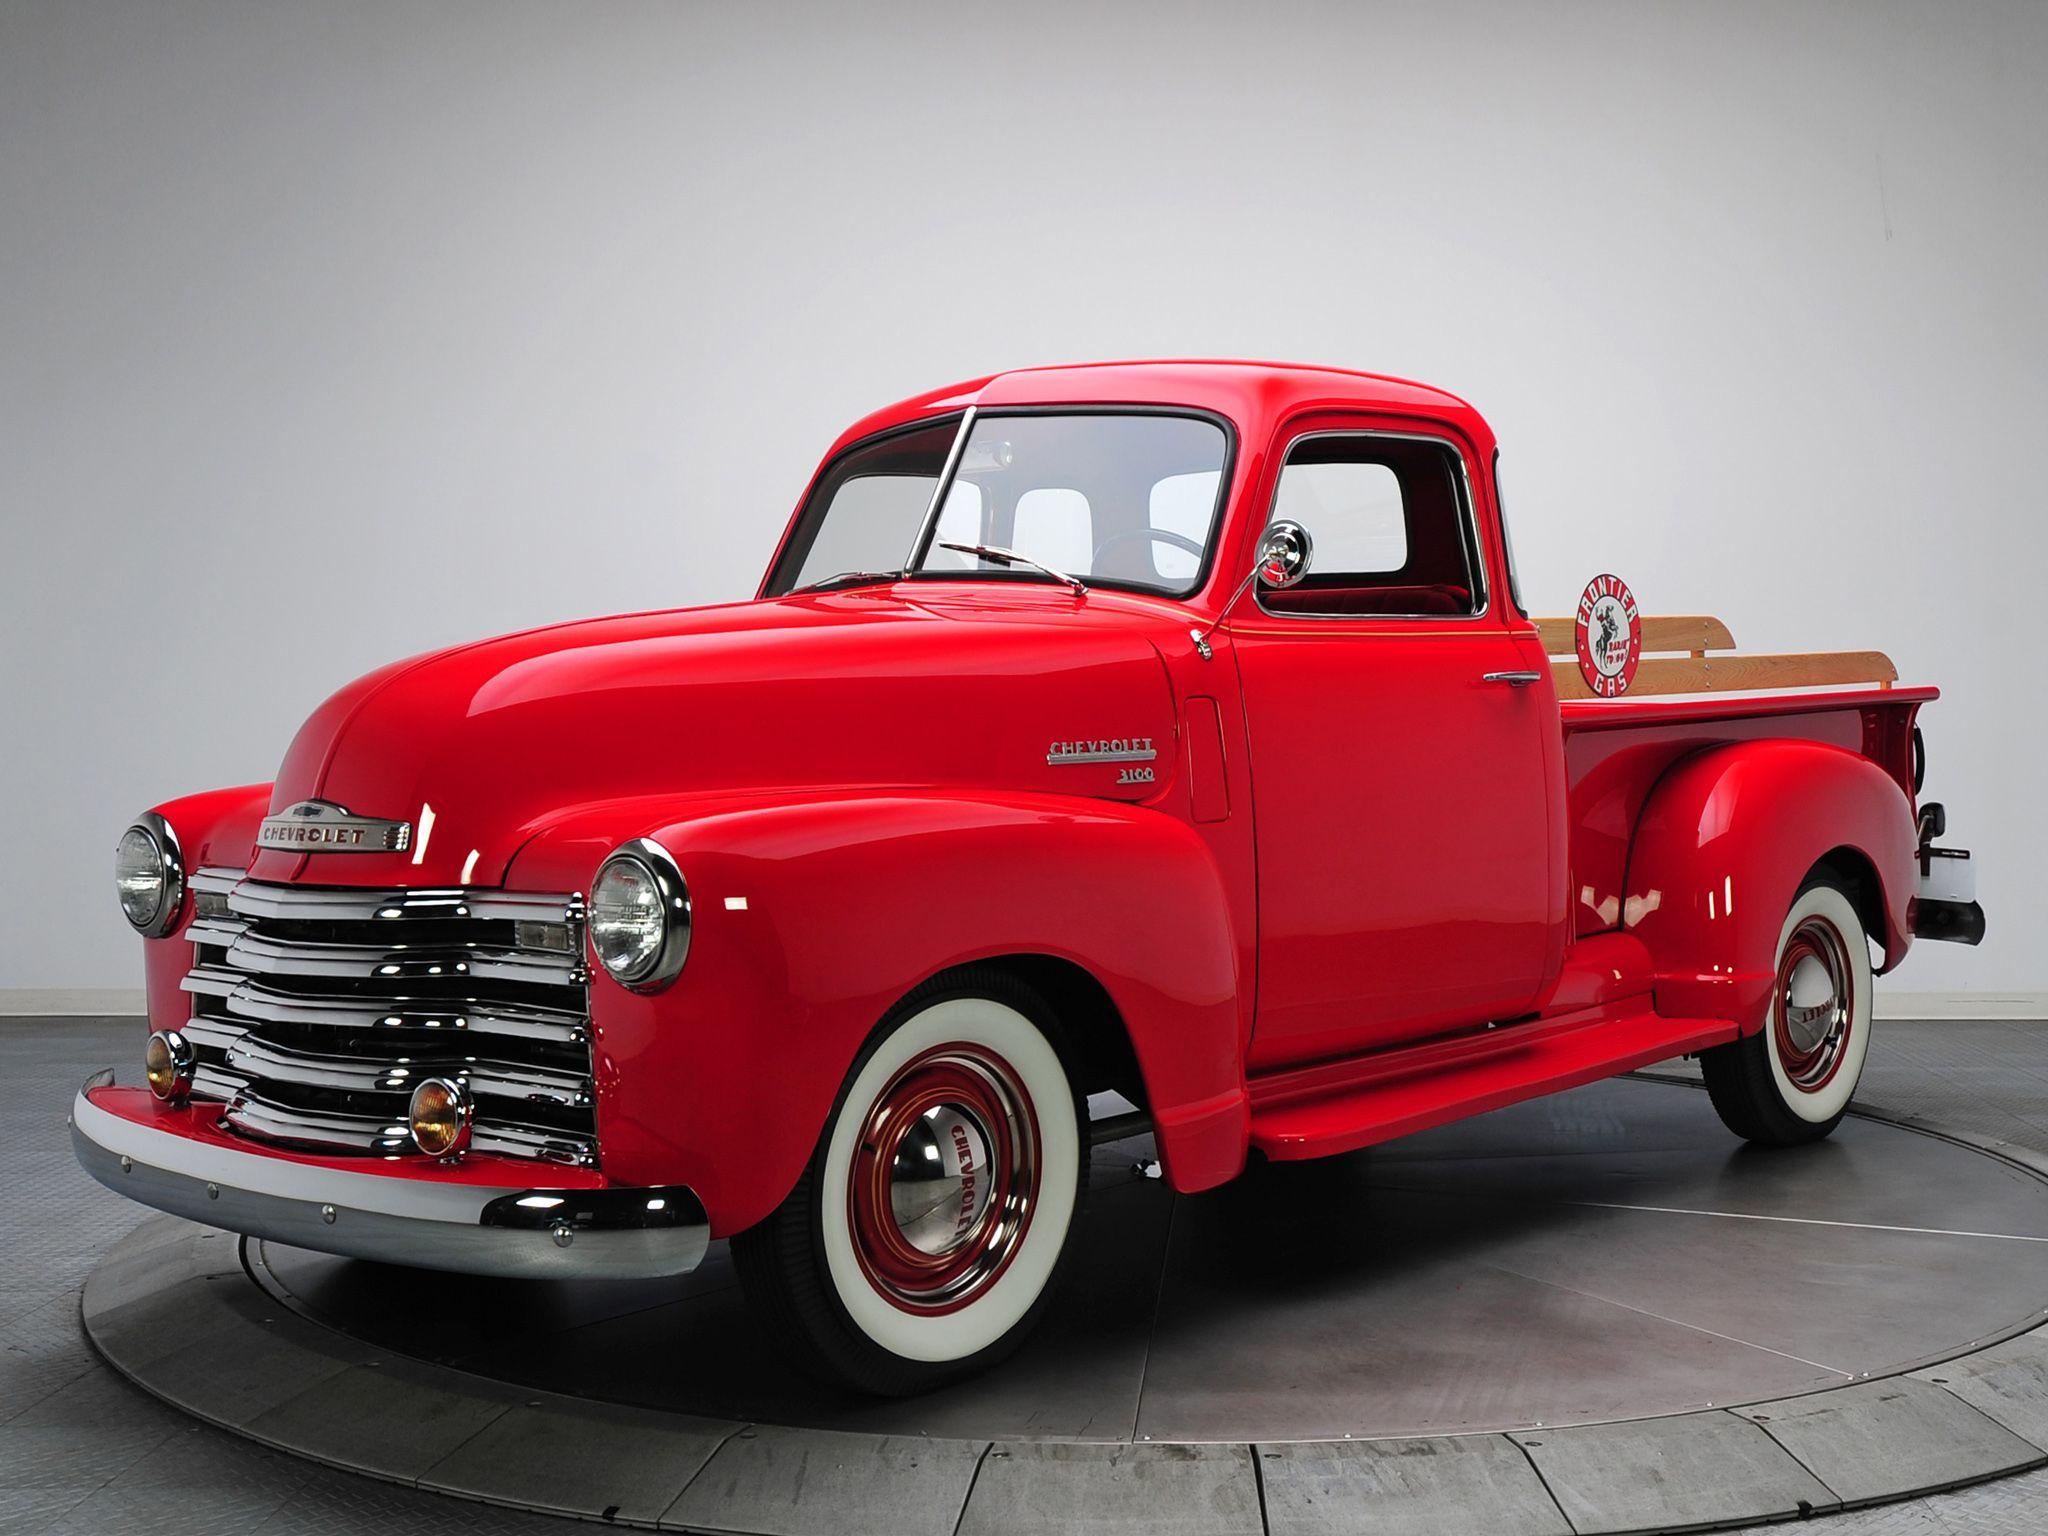 Chevrolet 3100 Pickup Chevy Trucks Chevrolet Pickup Classic Cars Trucks